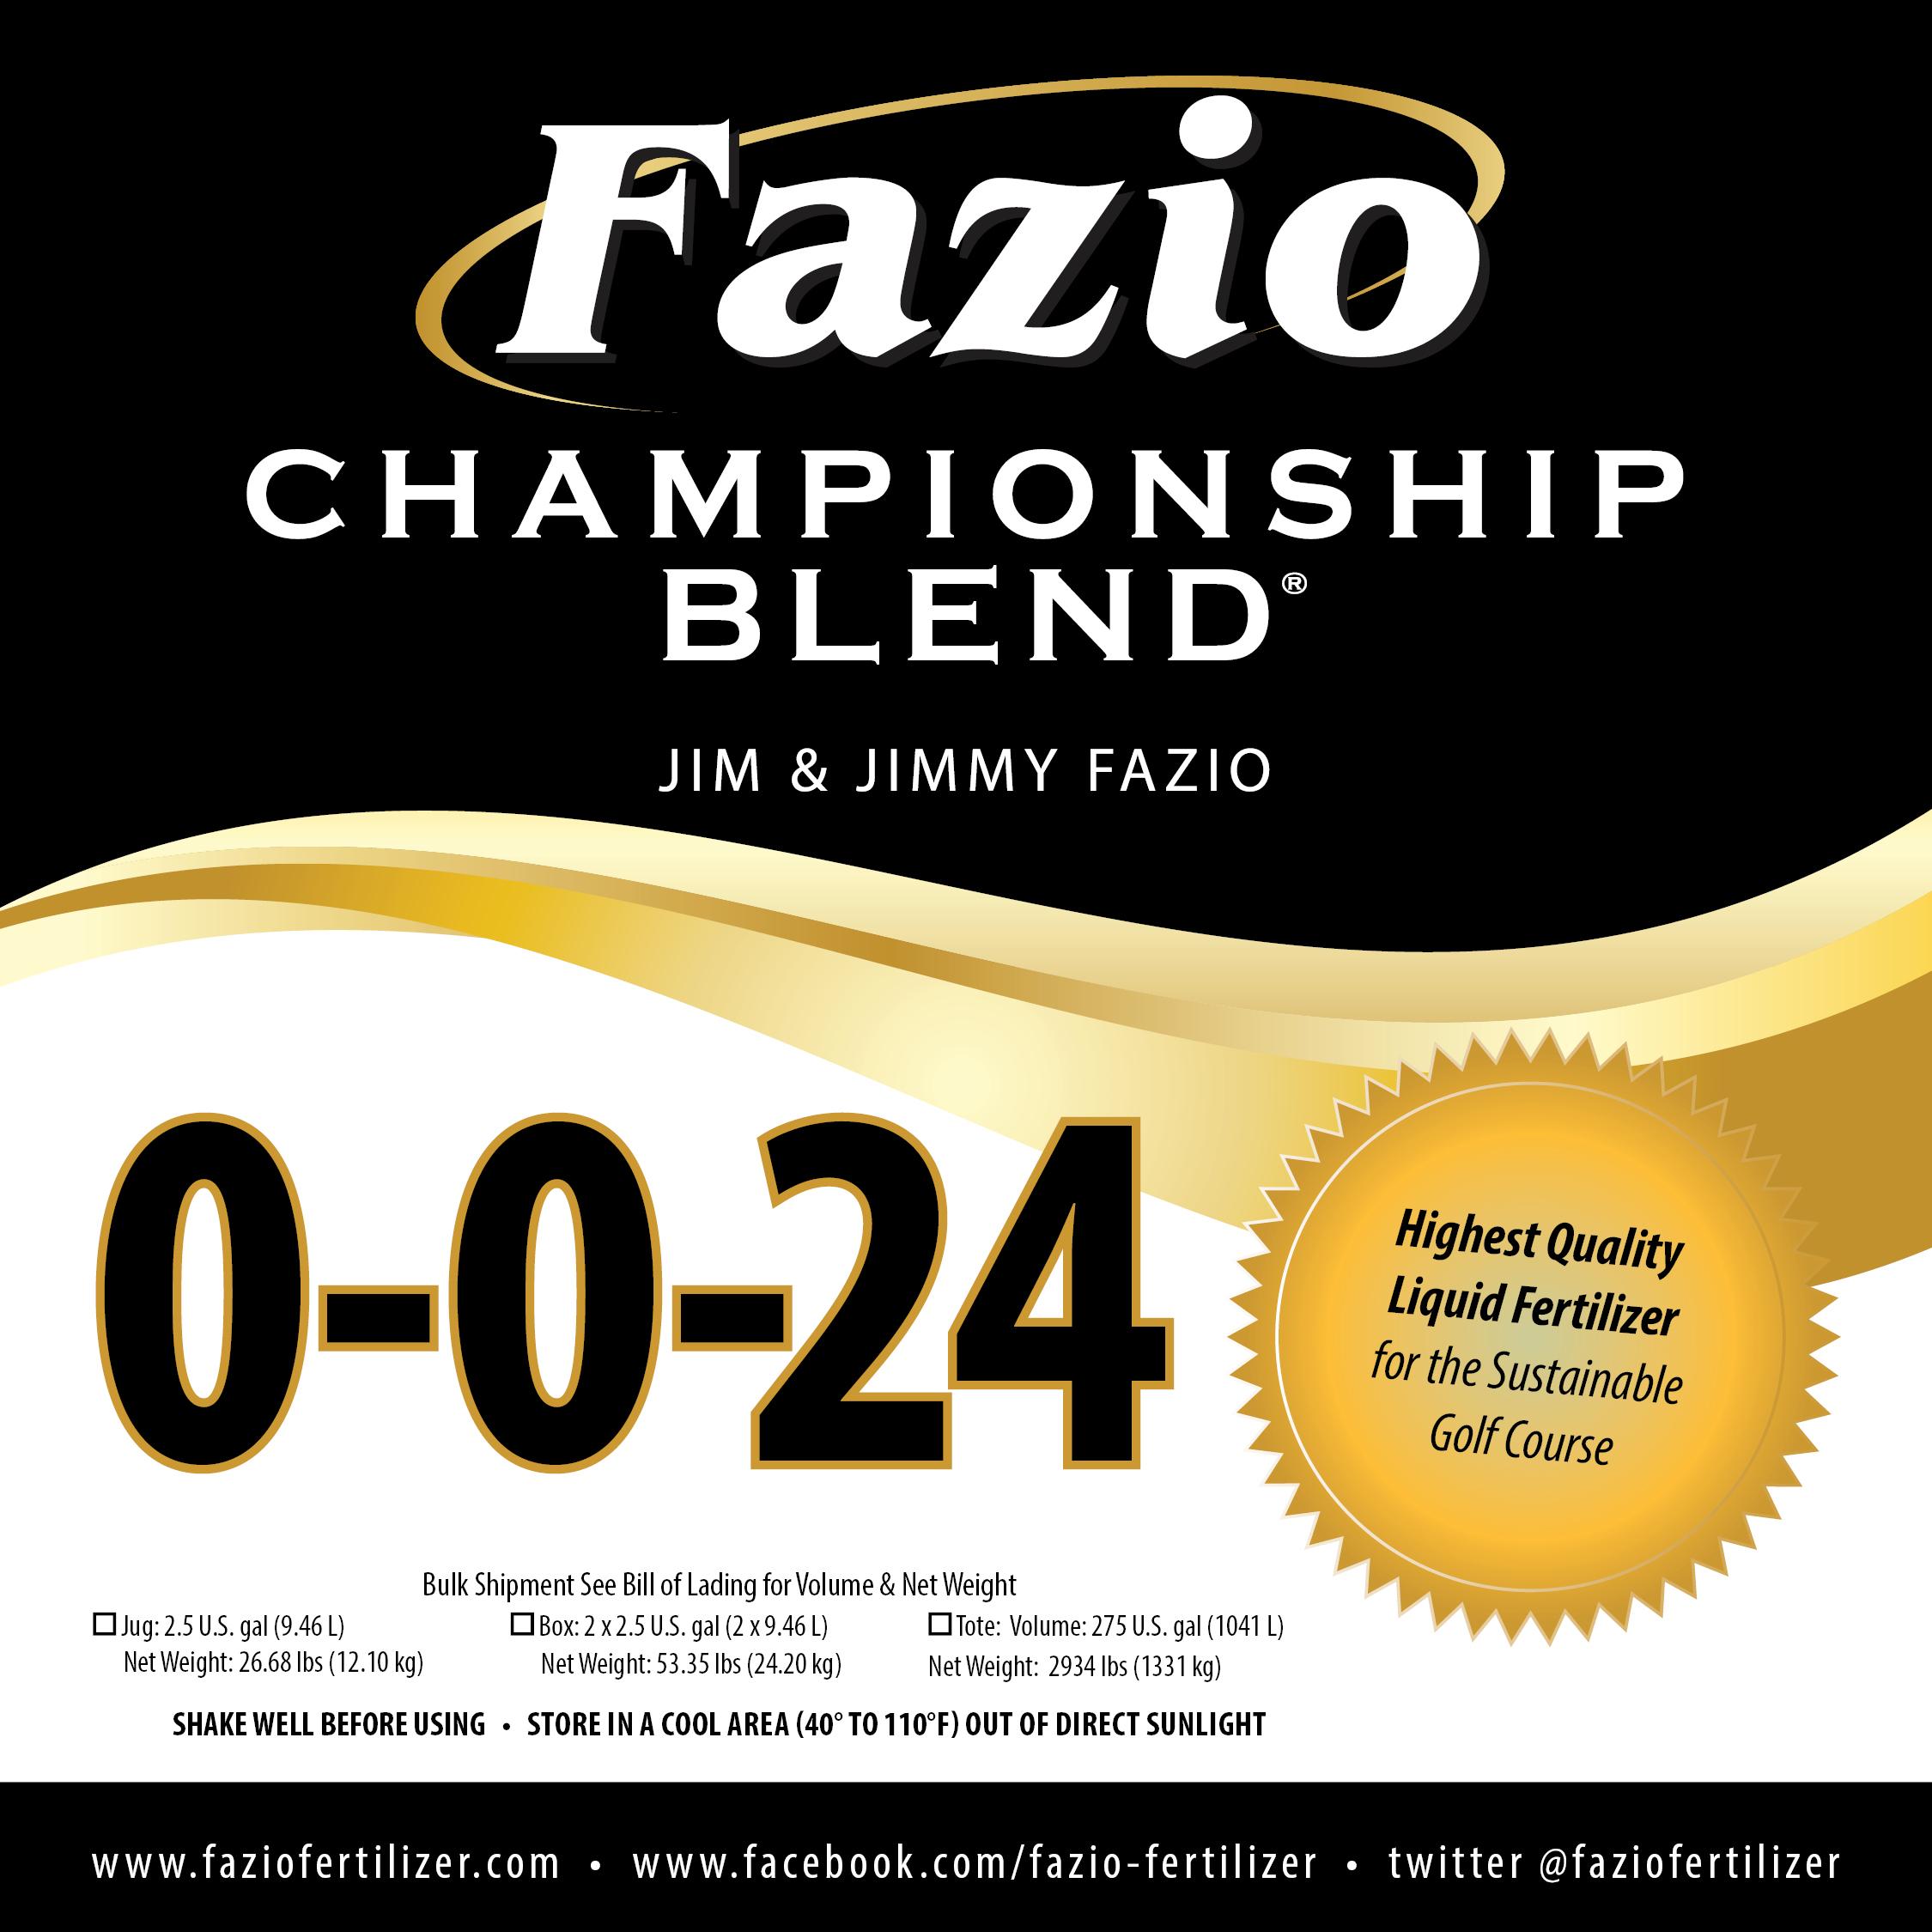 Fazio Championship Blend 0-0-24